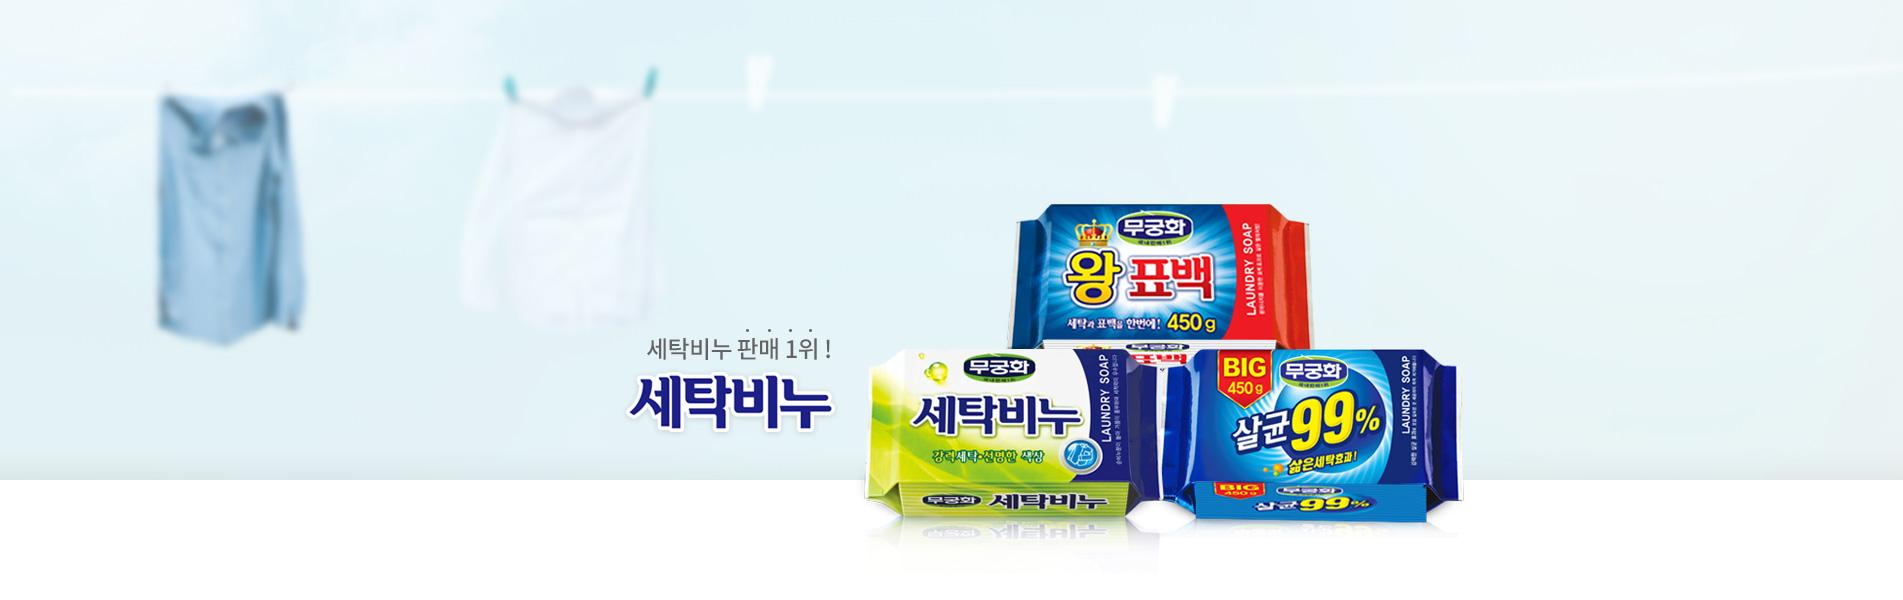 brand-laundry-soap-02